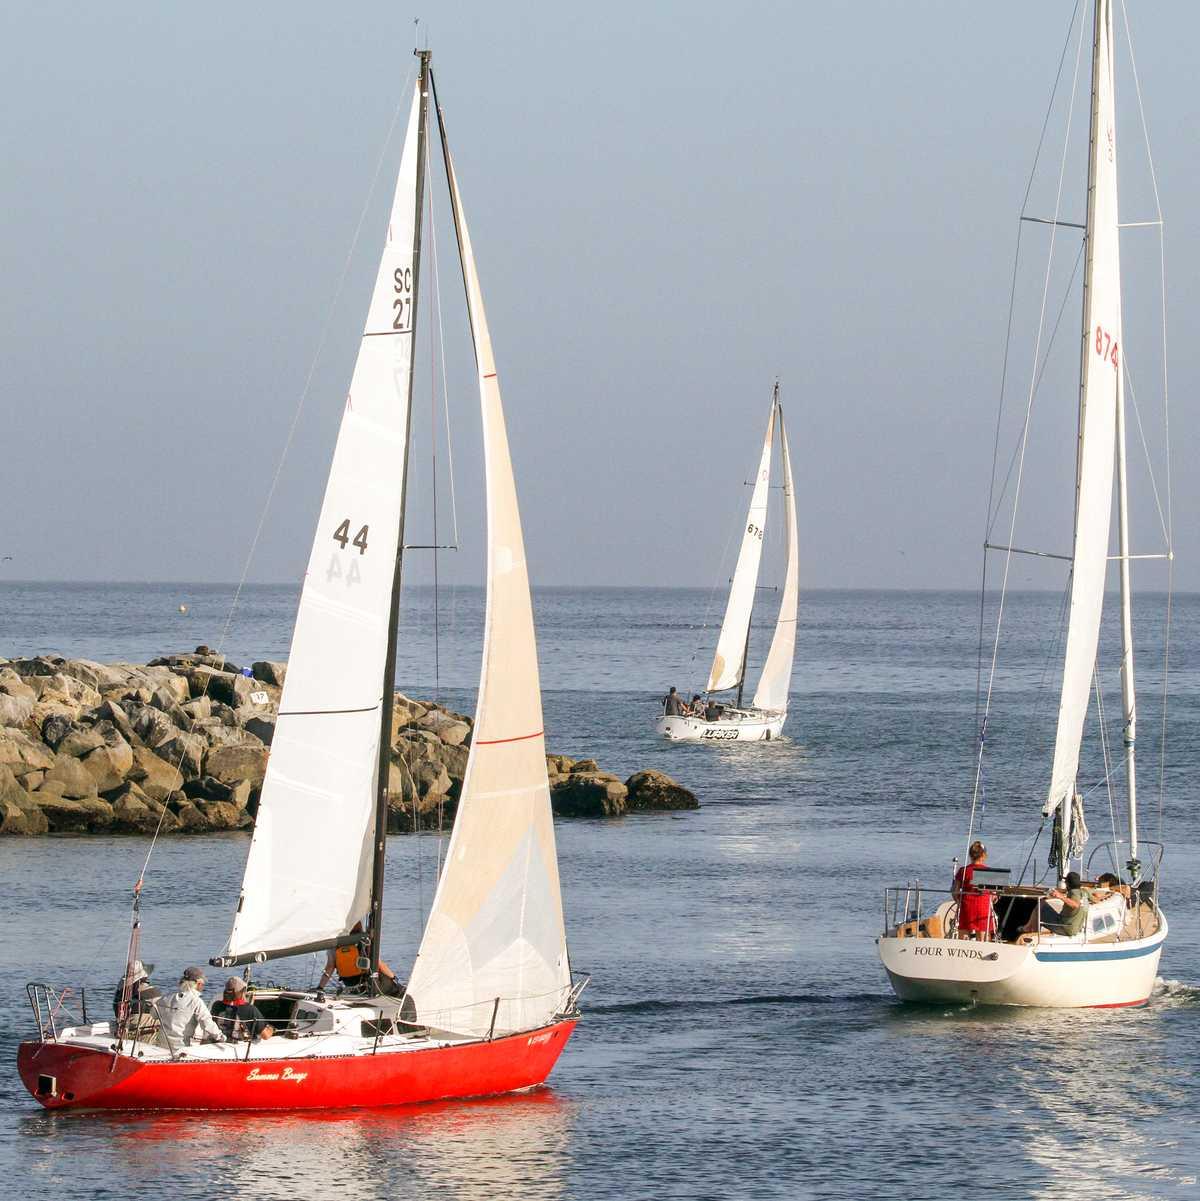 Teilnehmer des Wednesday Sailboat Races in Santa Cruz